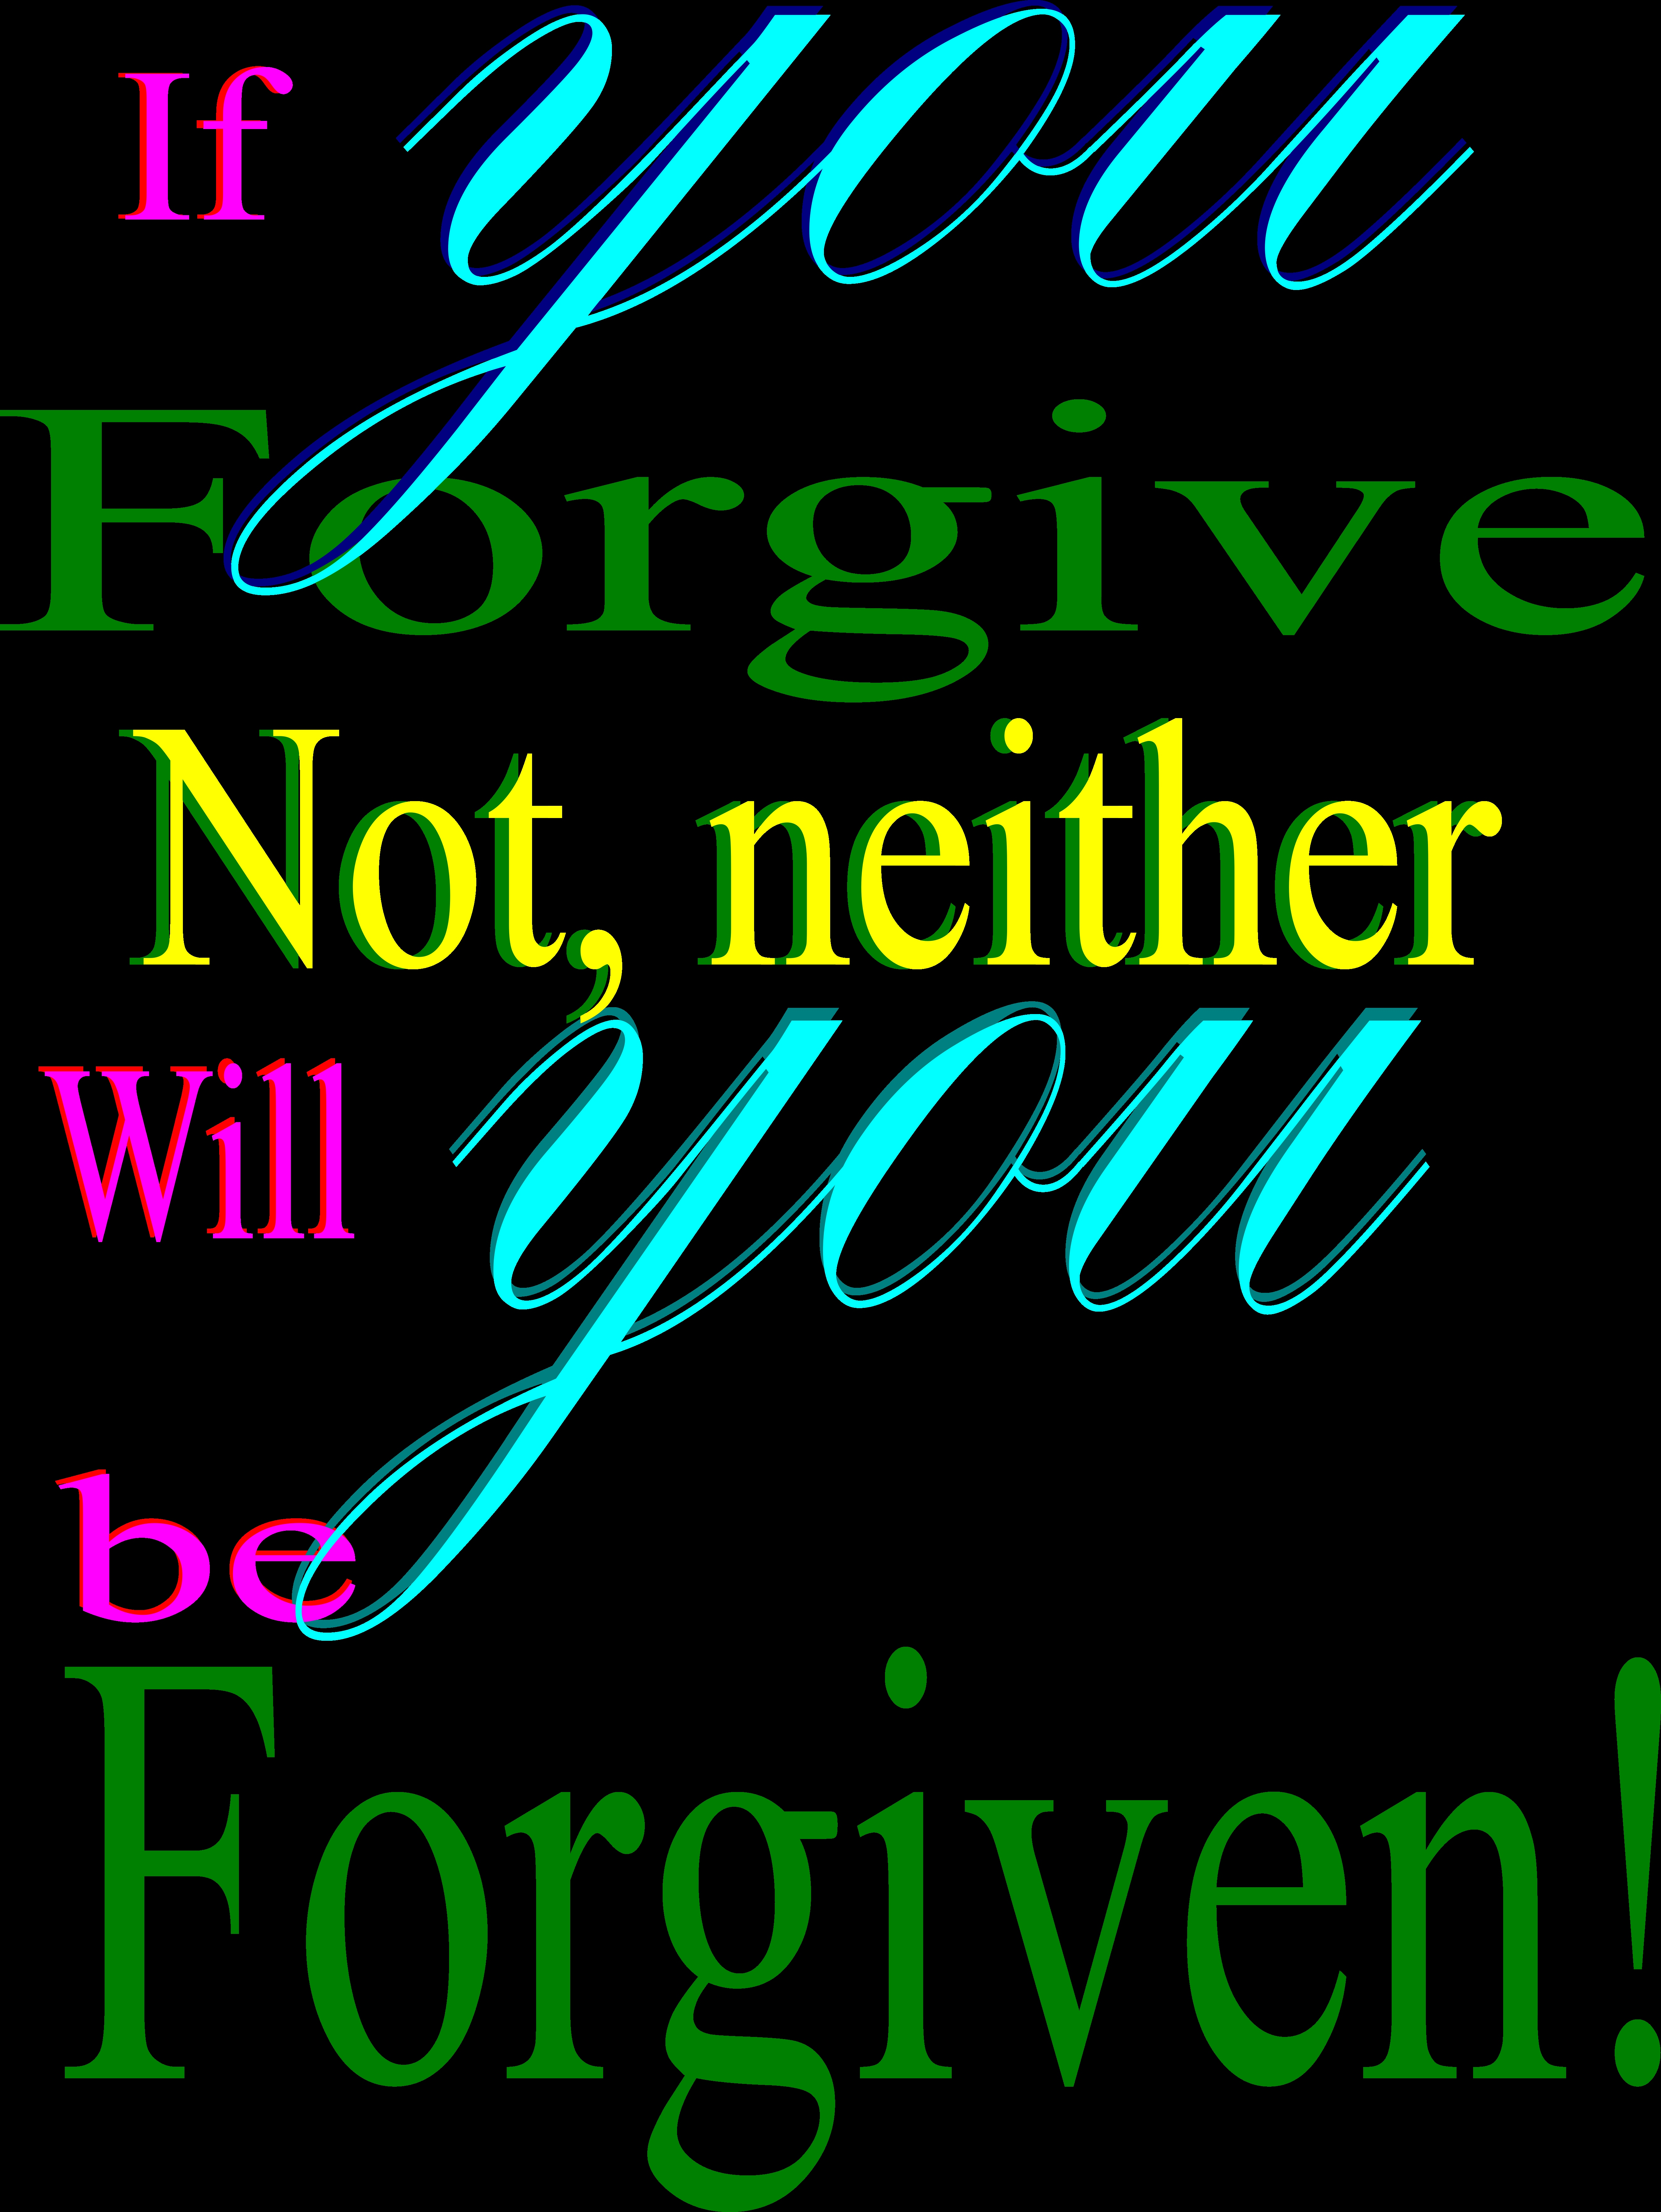 forgiveness 1 (2)